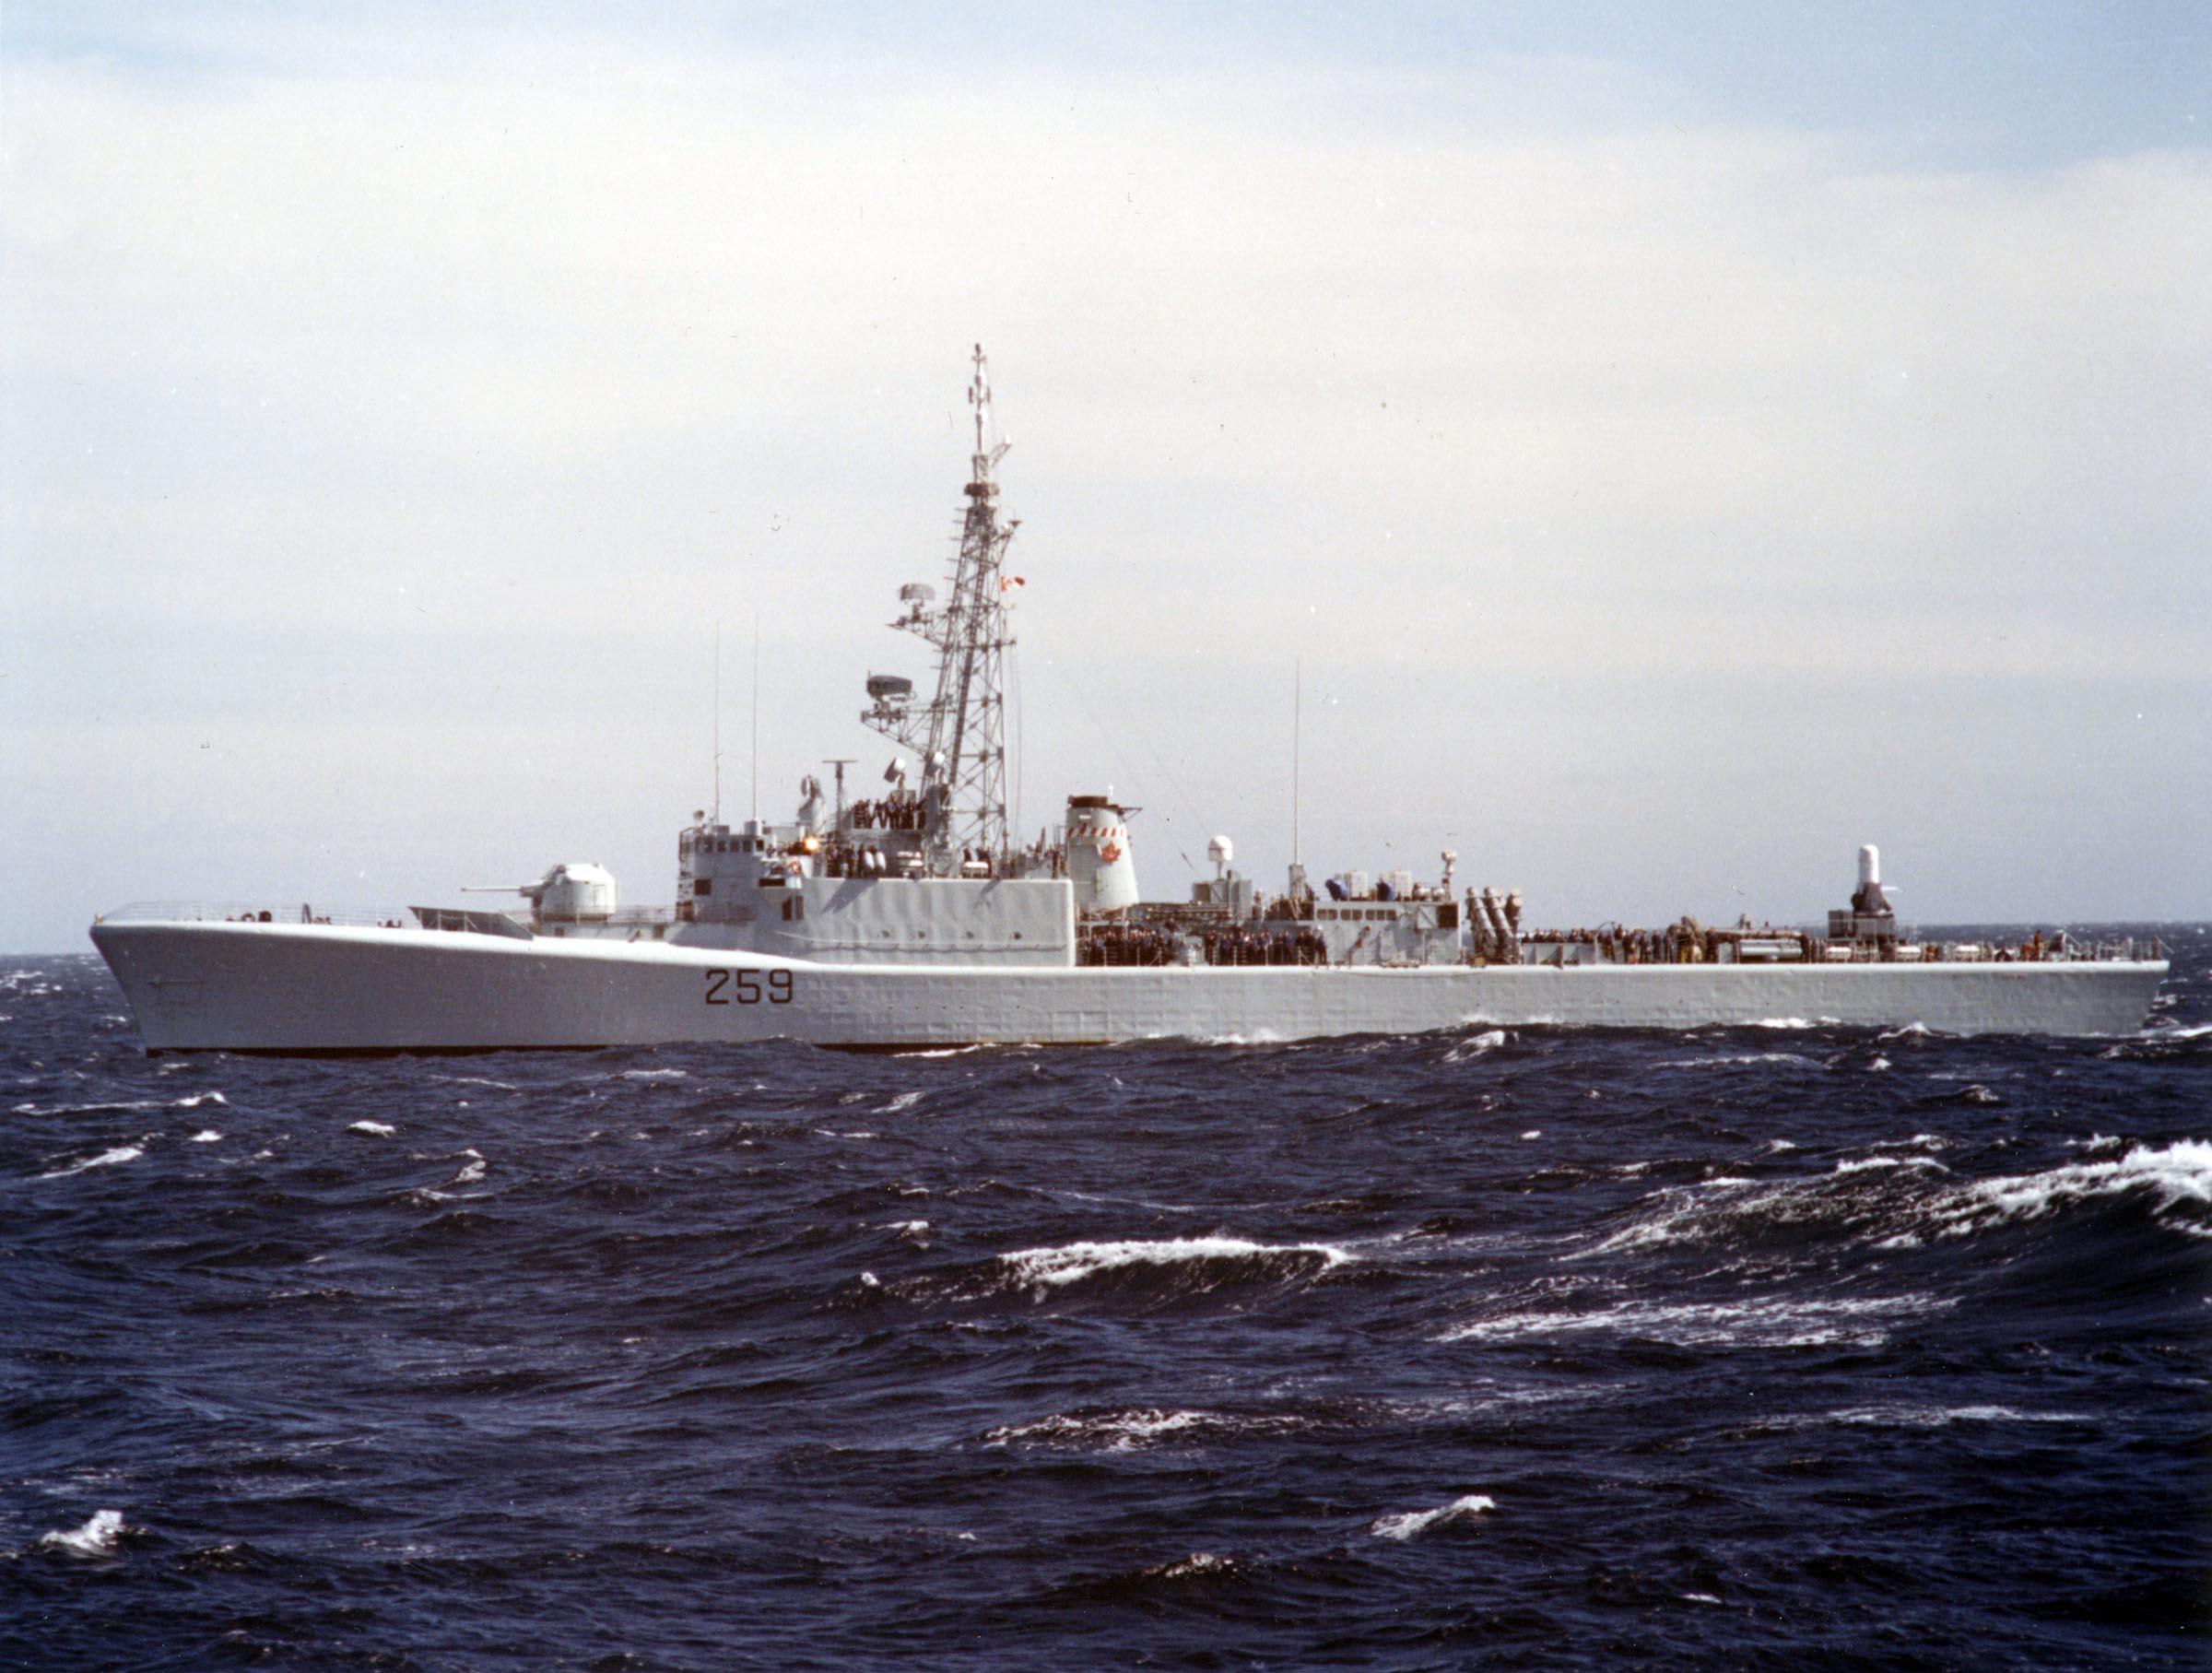 HMCS TERRA NOVA